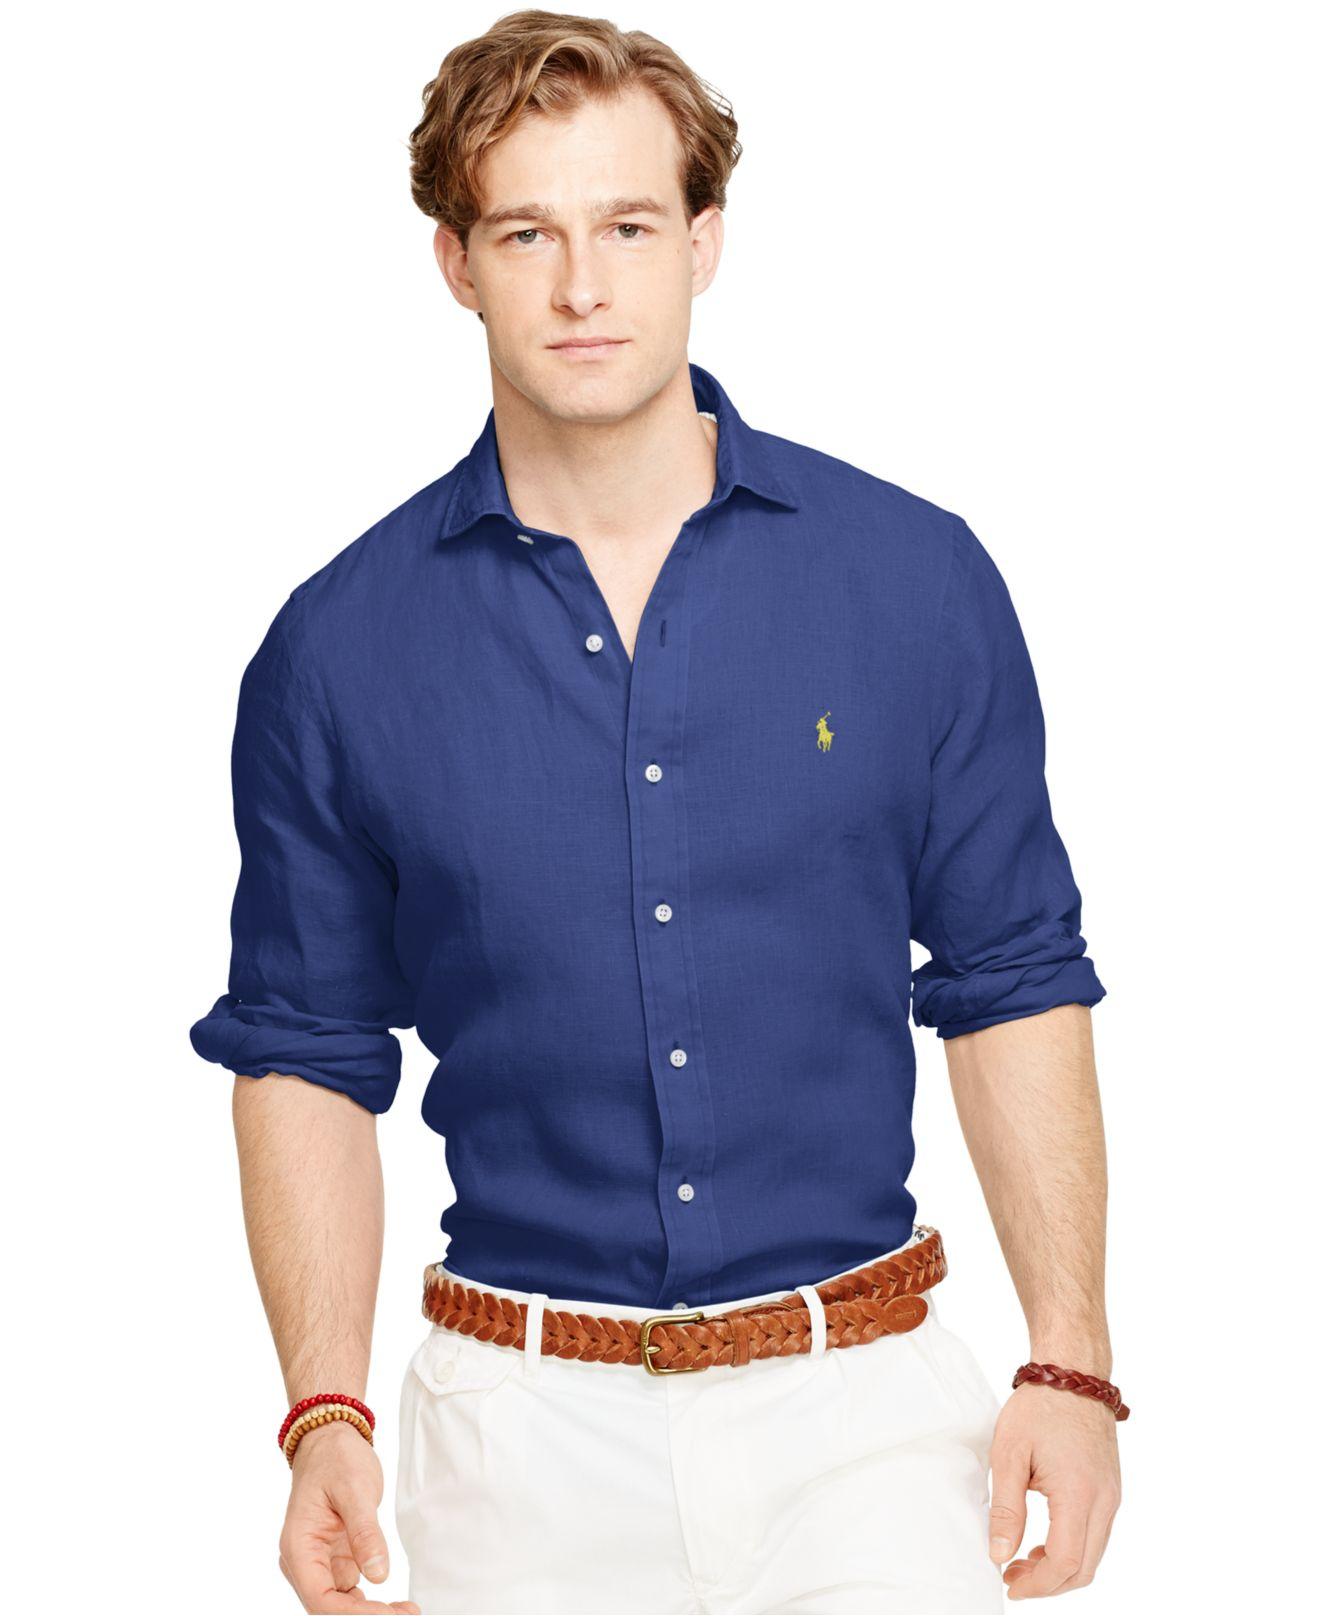 polo ralph lauren linen sport shirt in blue for men lyst. Black Bedroom Furniture Sets. Home Design Ideas